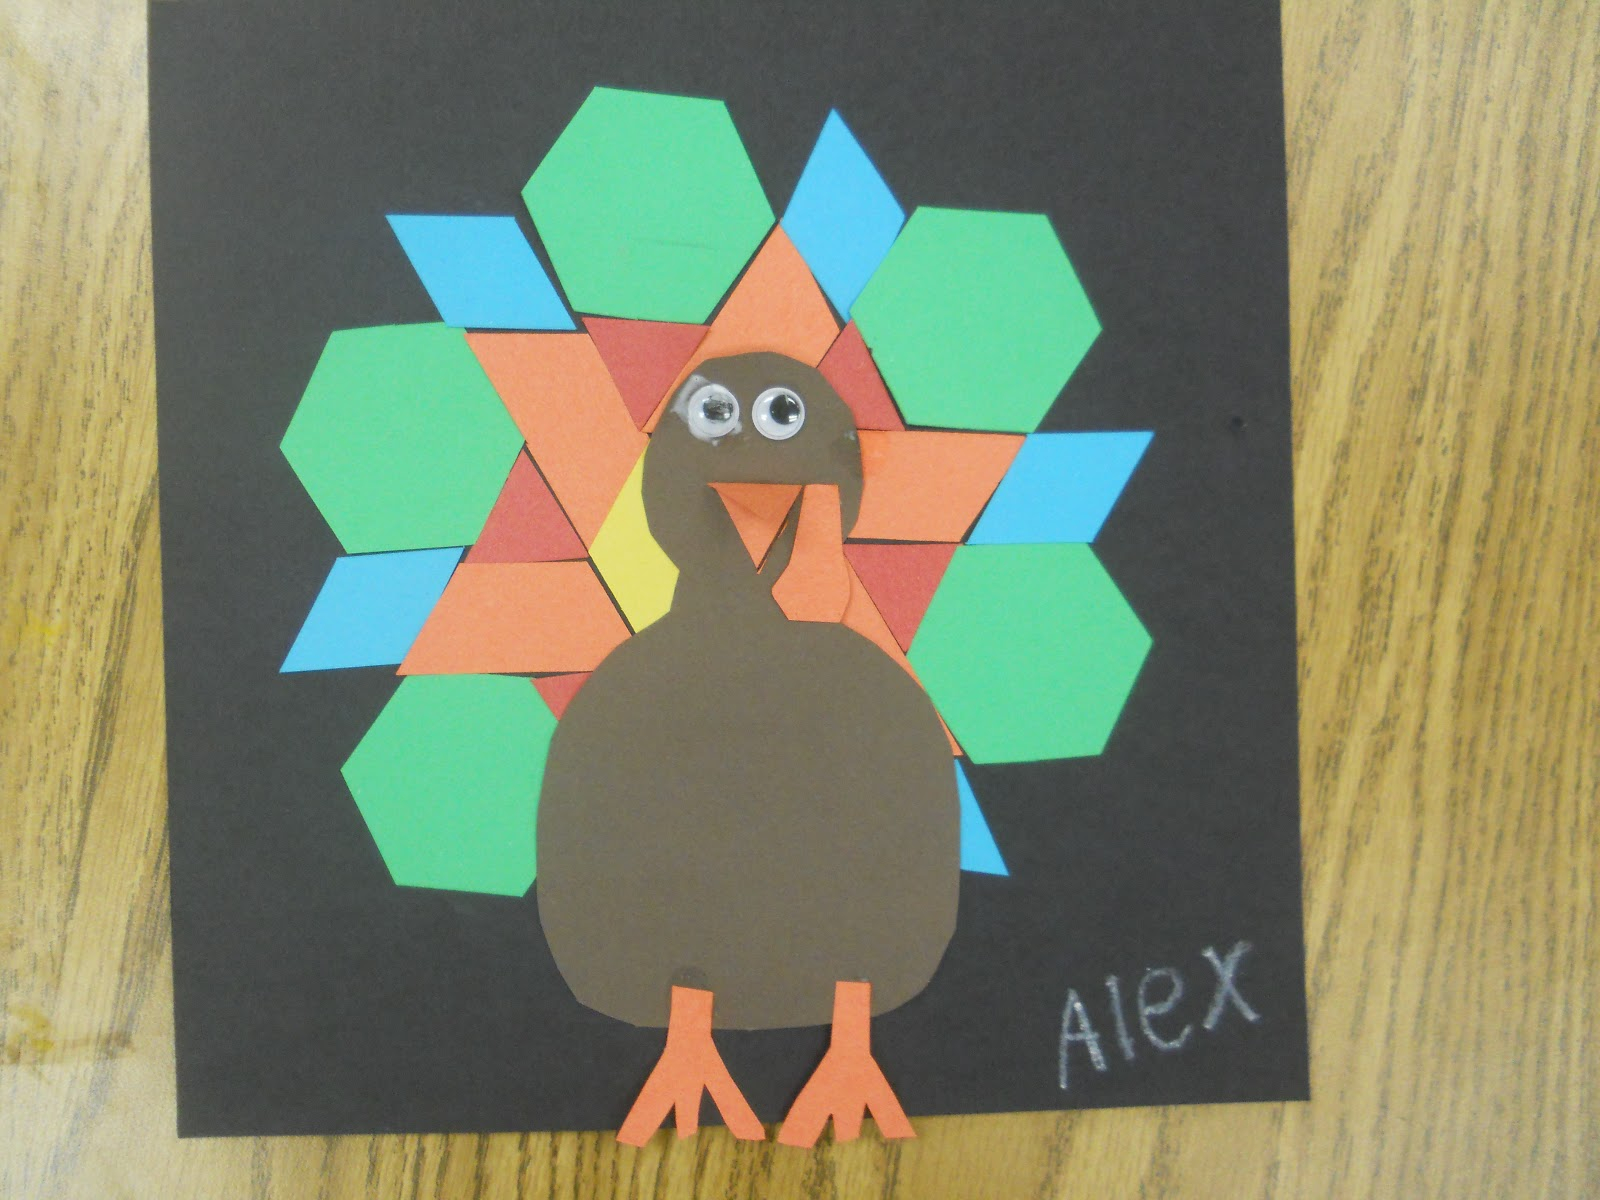 Mrs t 39 s first grade class pattern block turkeys for Turkey crafts for first grade